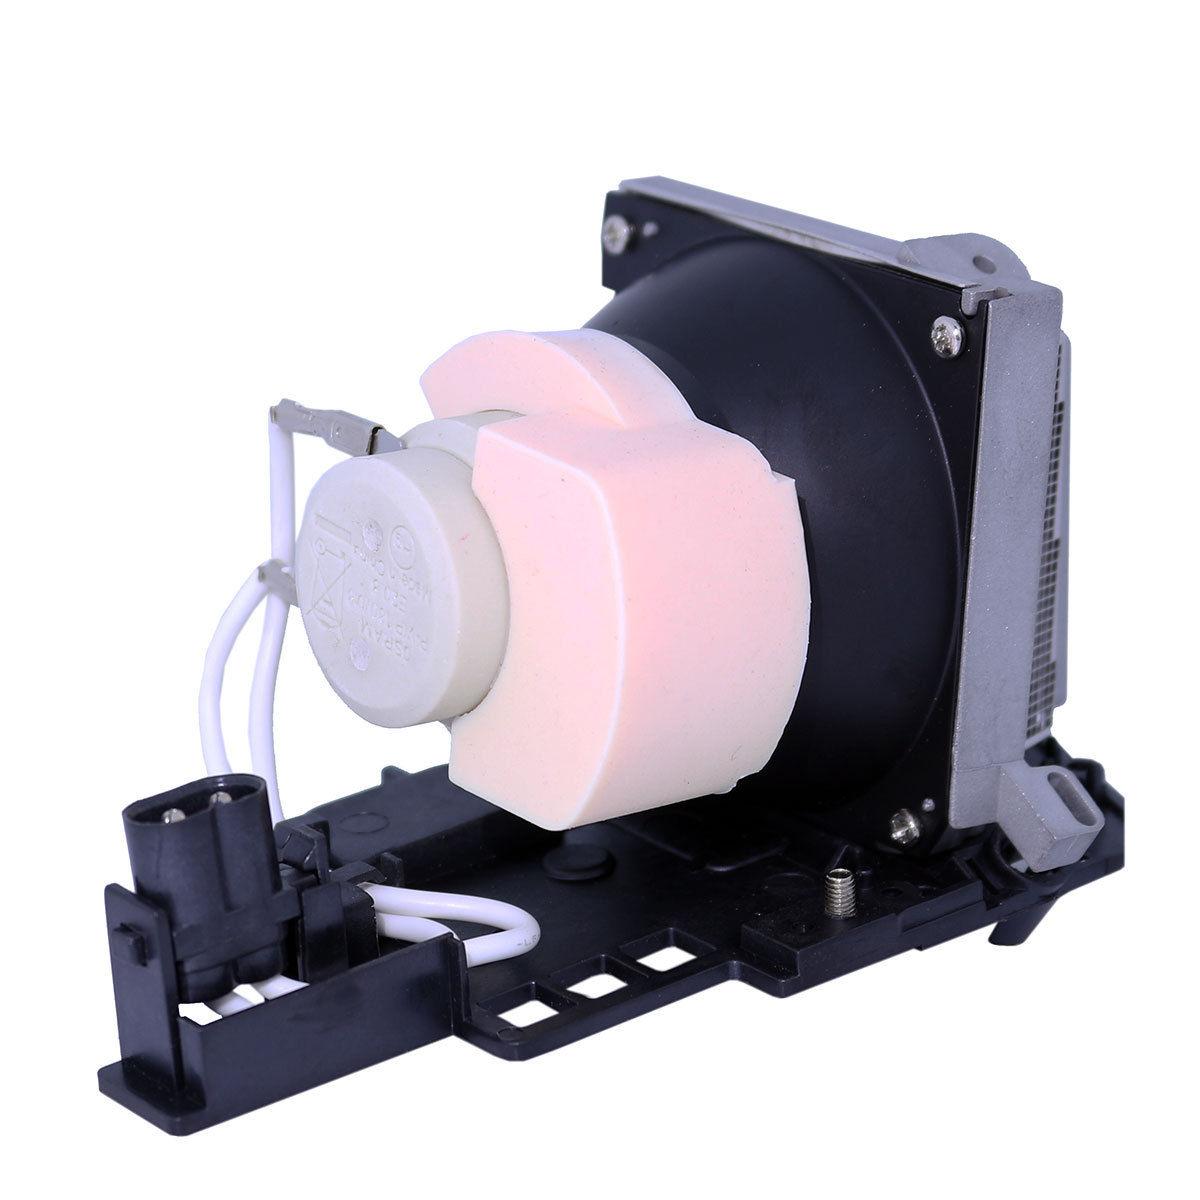 Фотография Osram Lamp Housing  EC.J6900.001  For Acer P1266  P1166  Projector DLP LCD Bulb